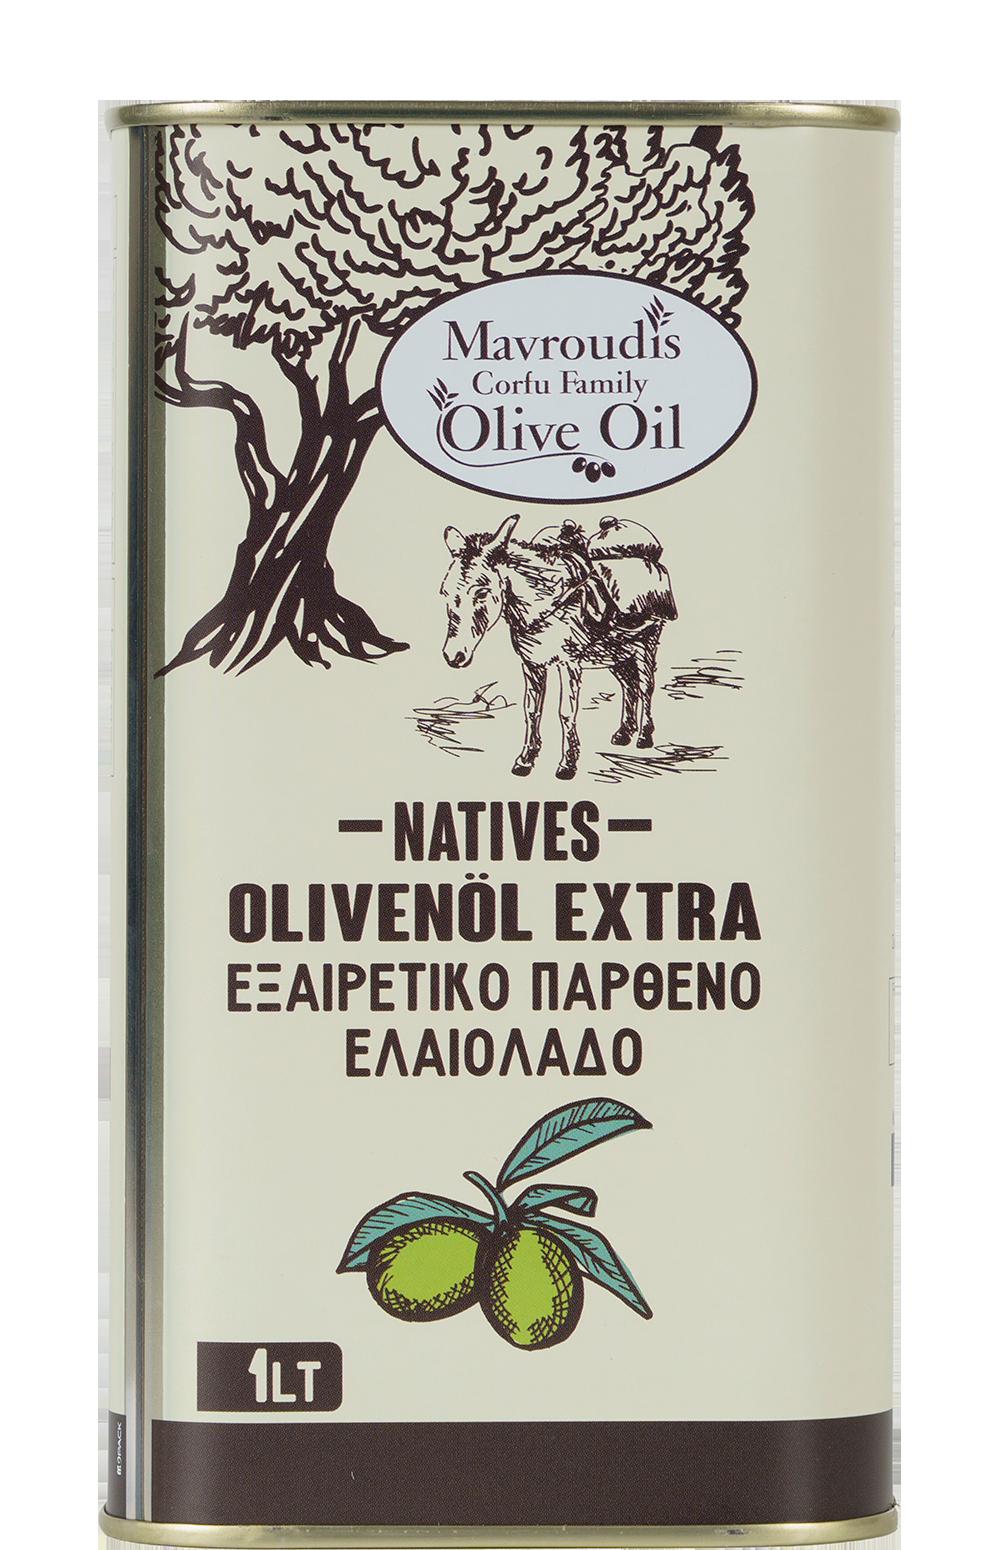 Mavroudis Corfu Family EVOO